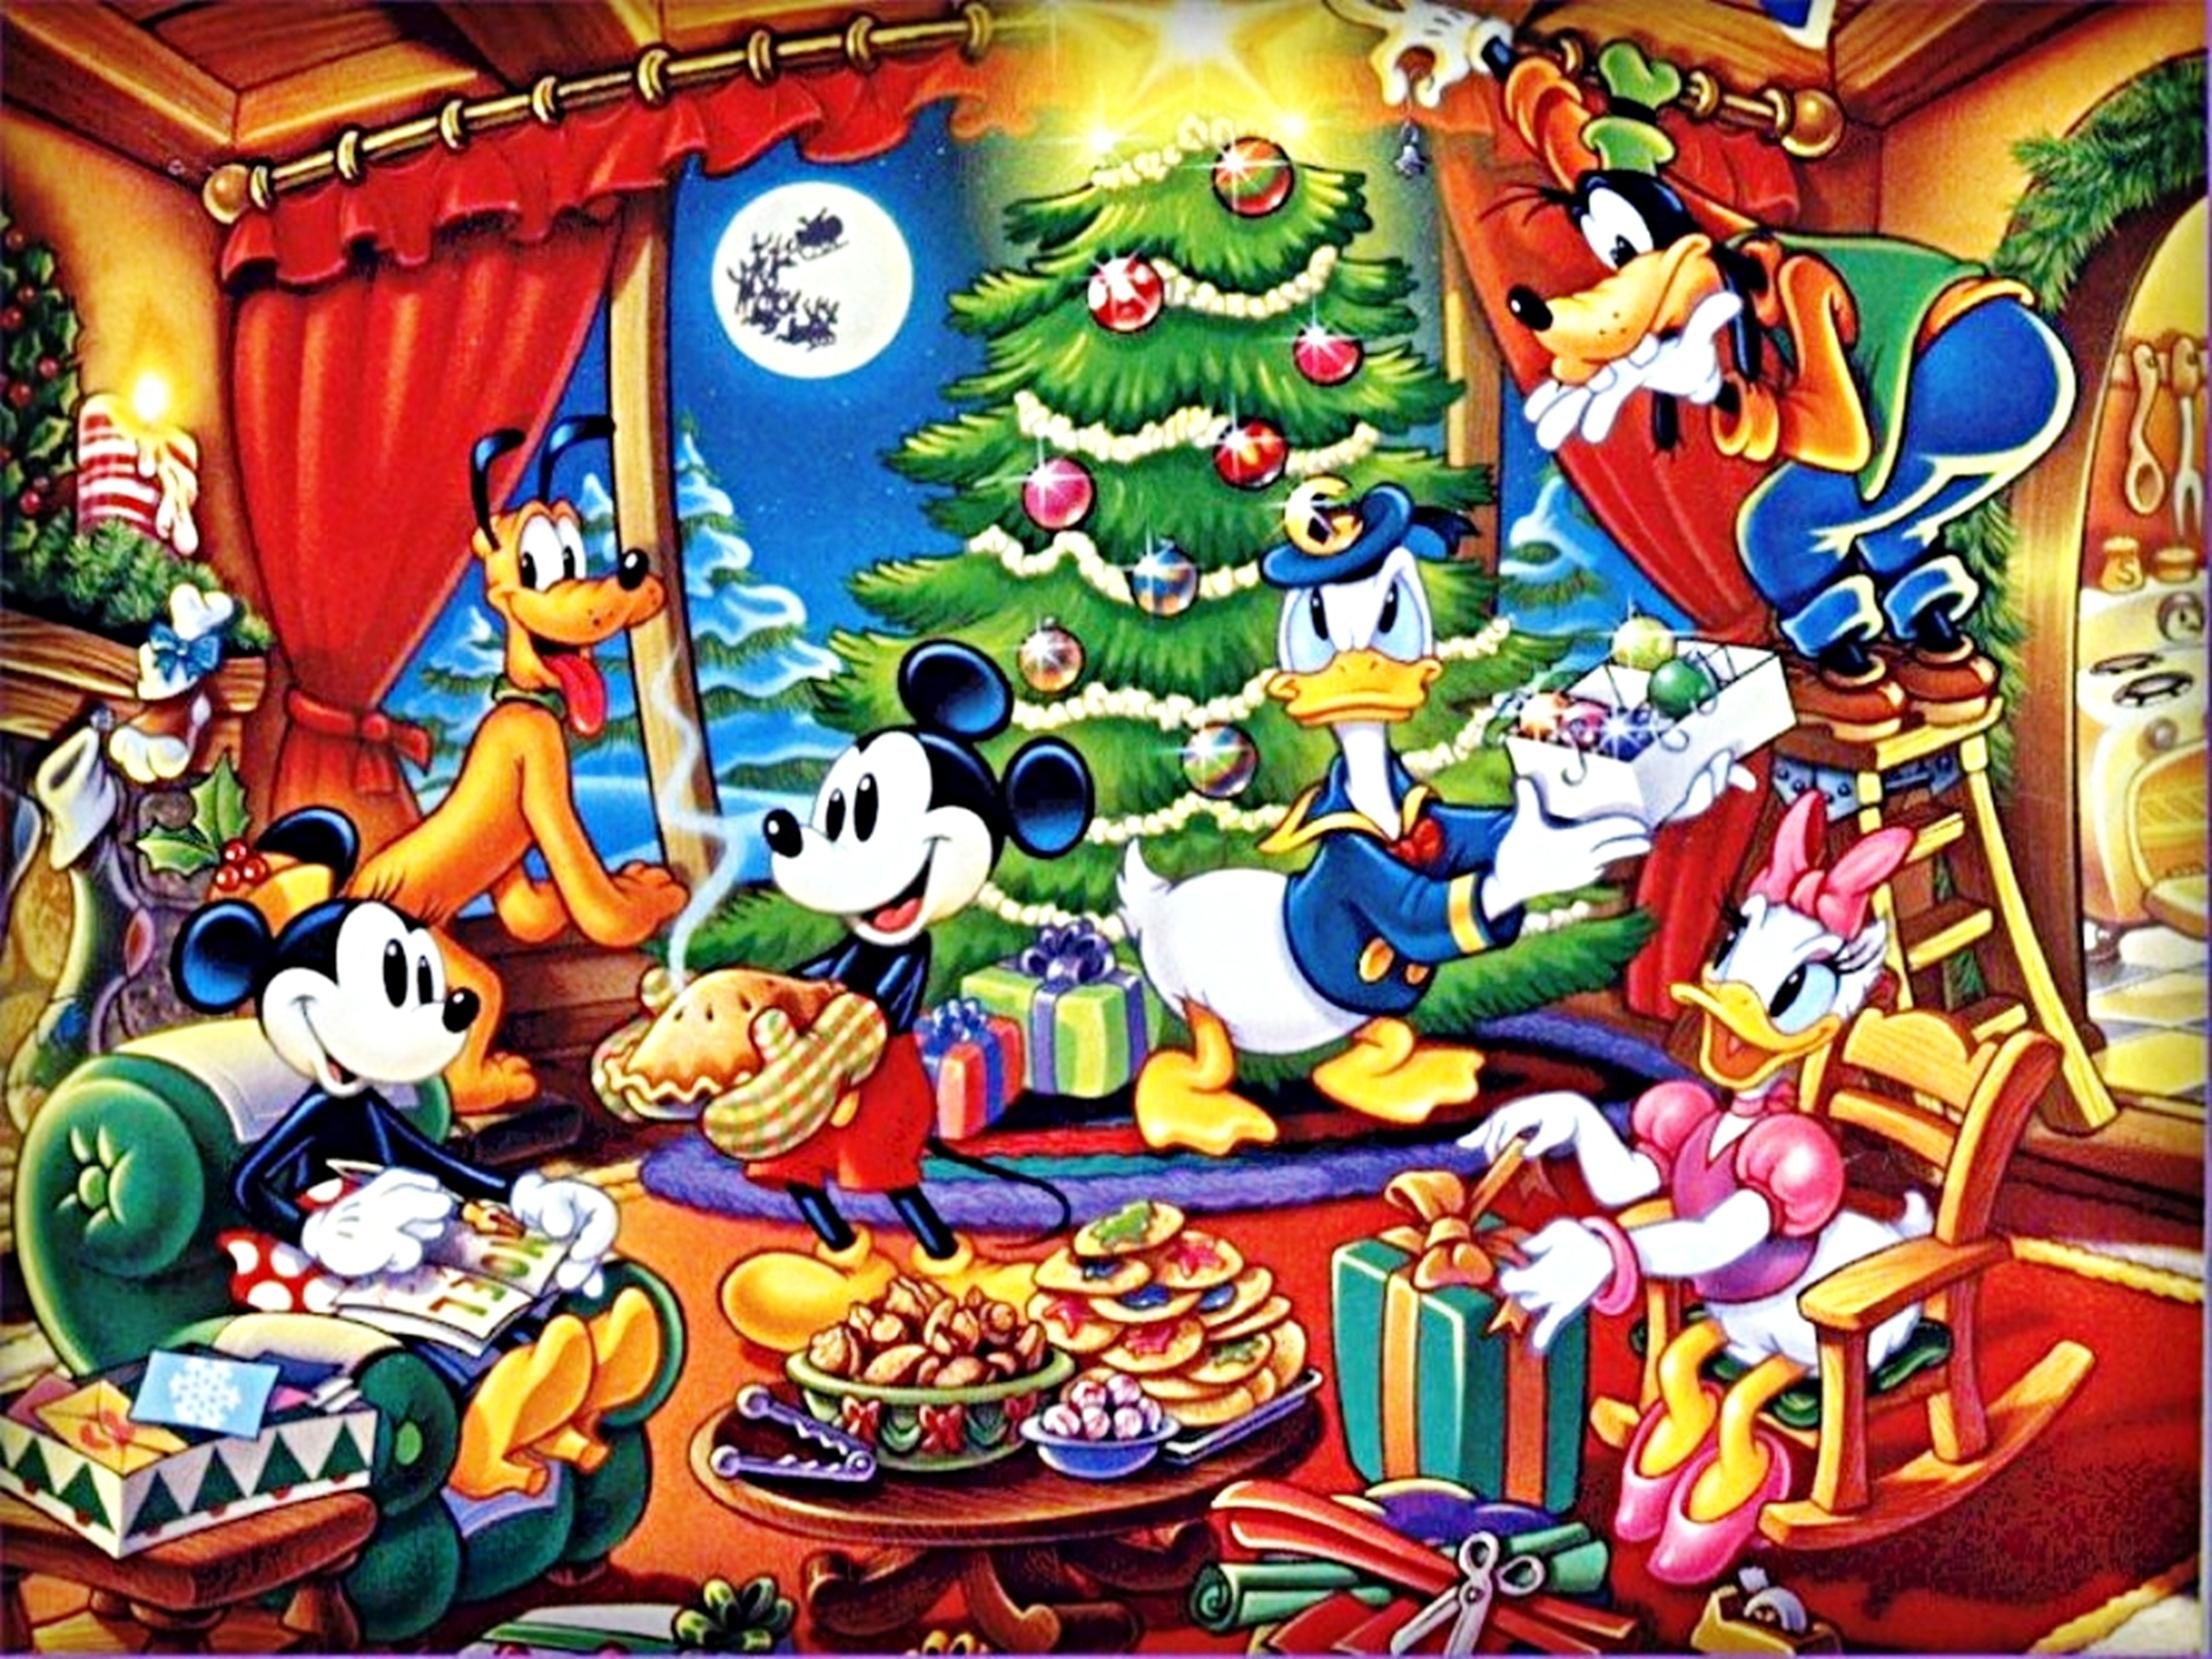 Disney Wallpapers The Disney Gang Christmas walt disney characters 2212x1659